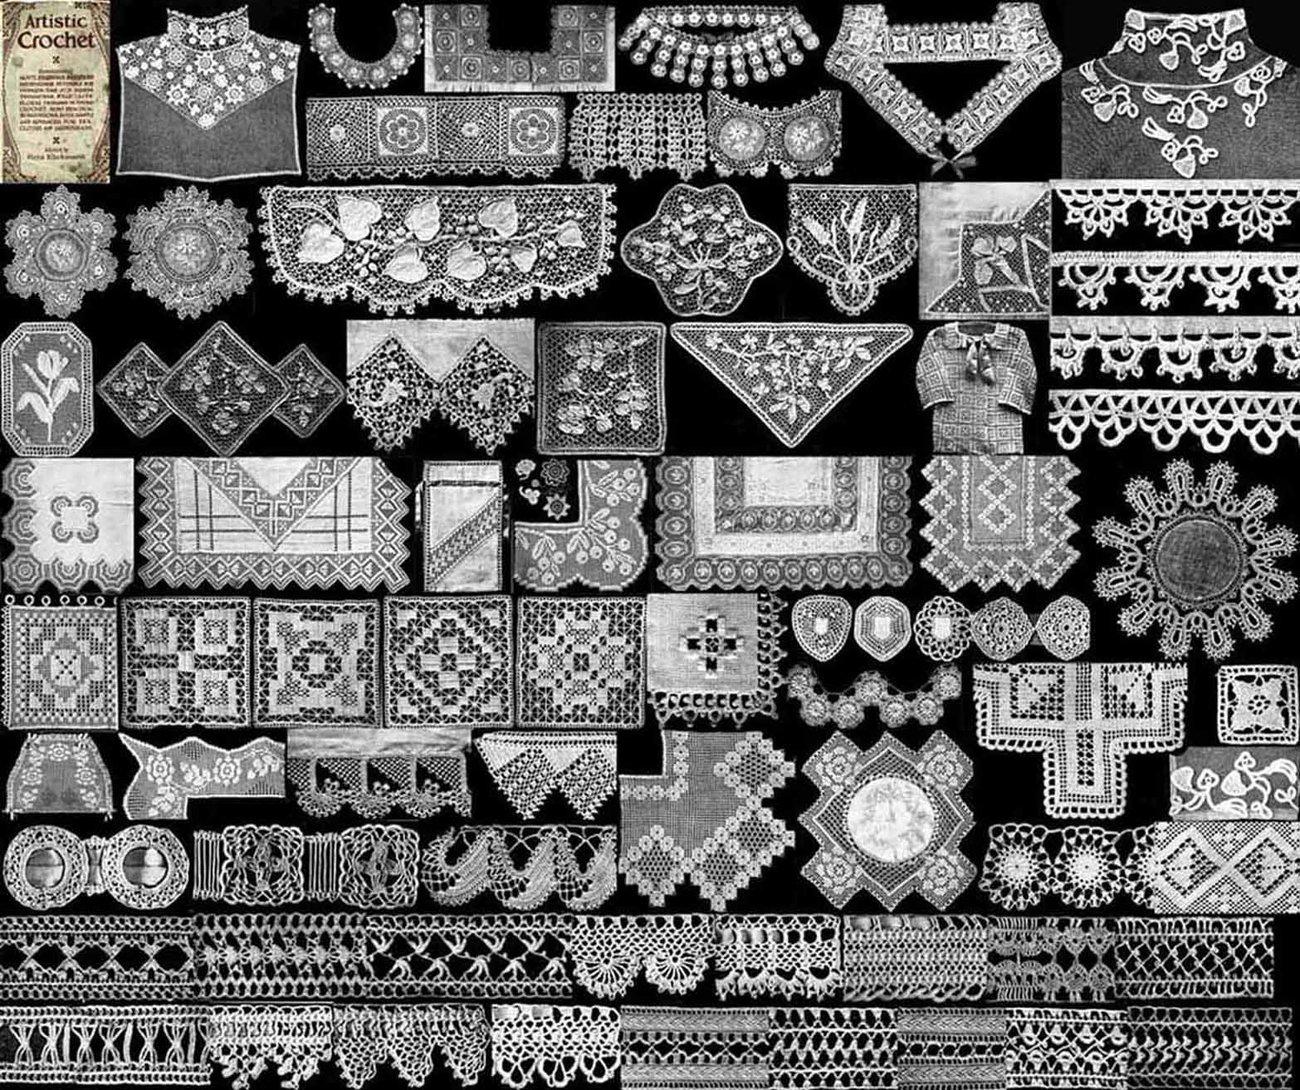 Irish Lace Crochet Free Pattern Crochet Guild